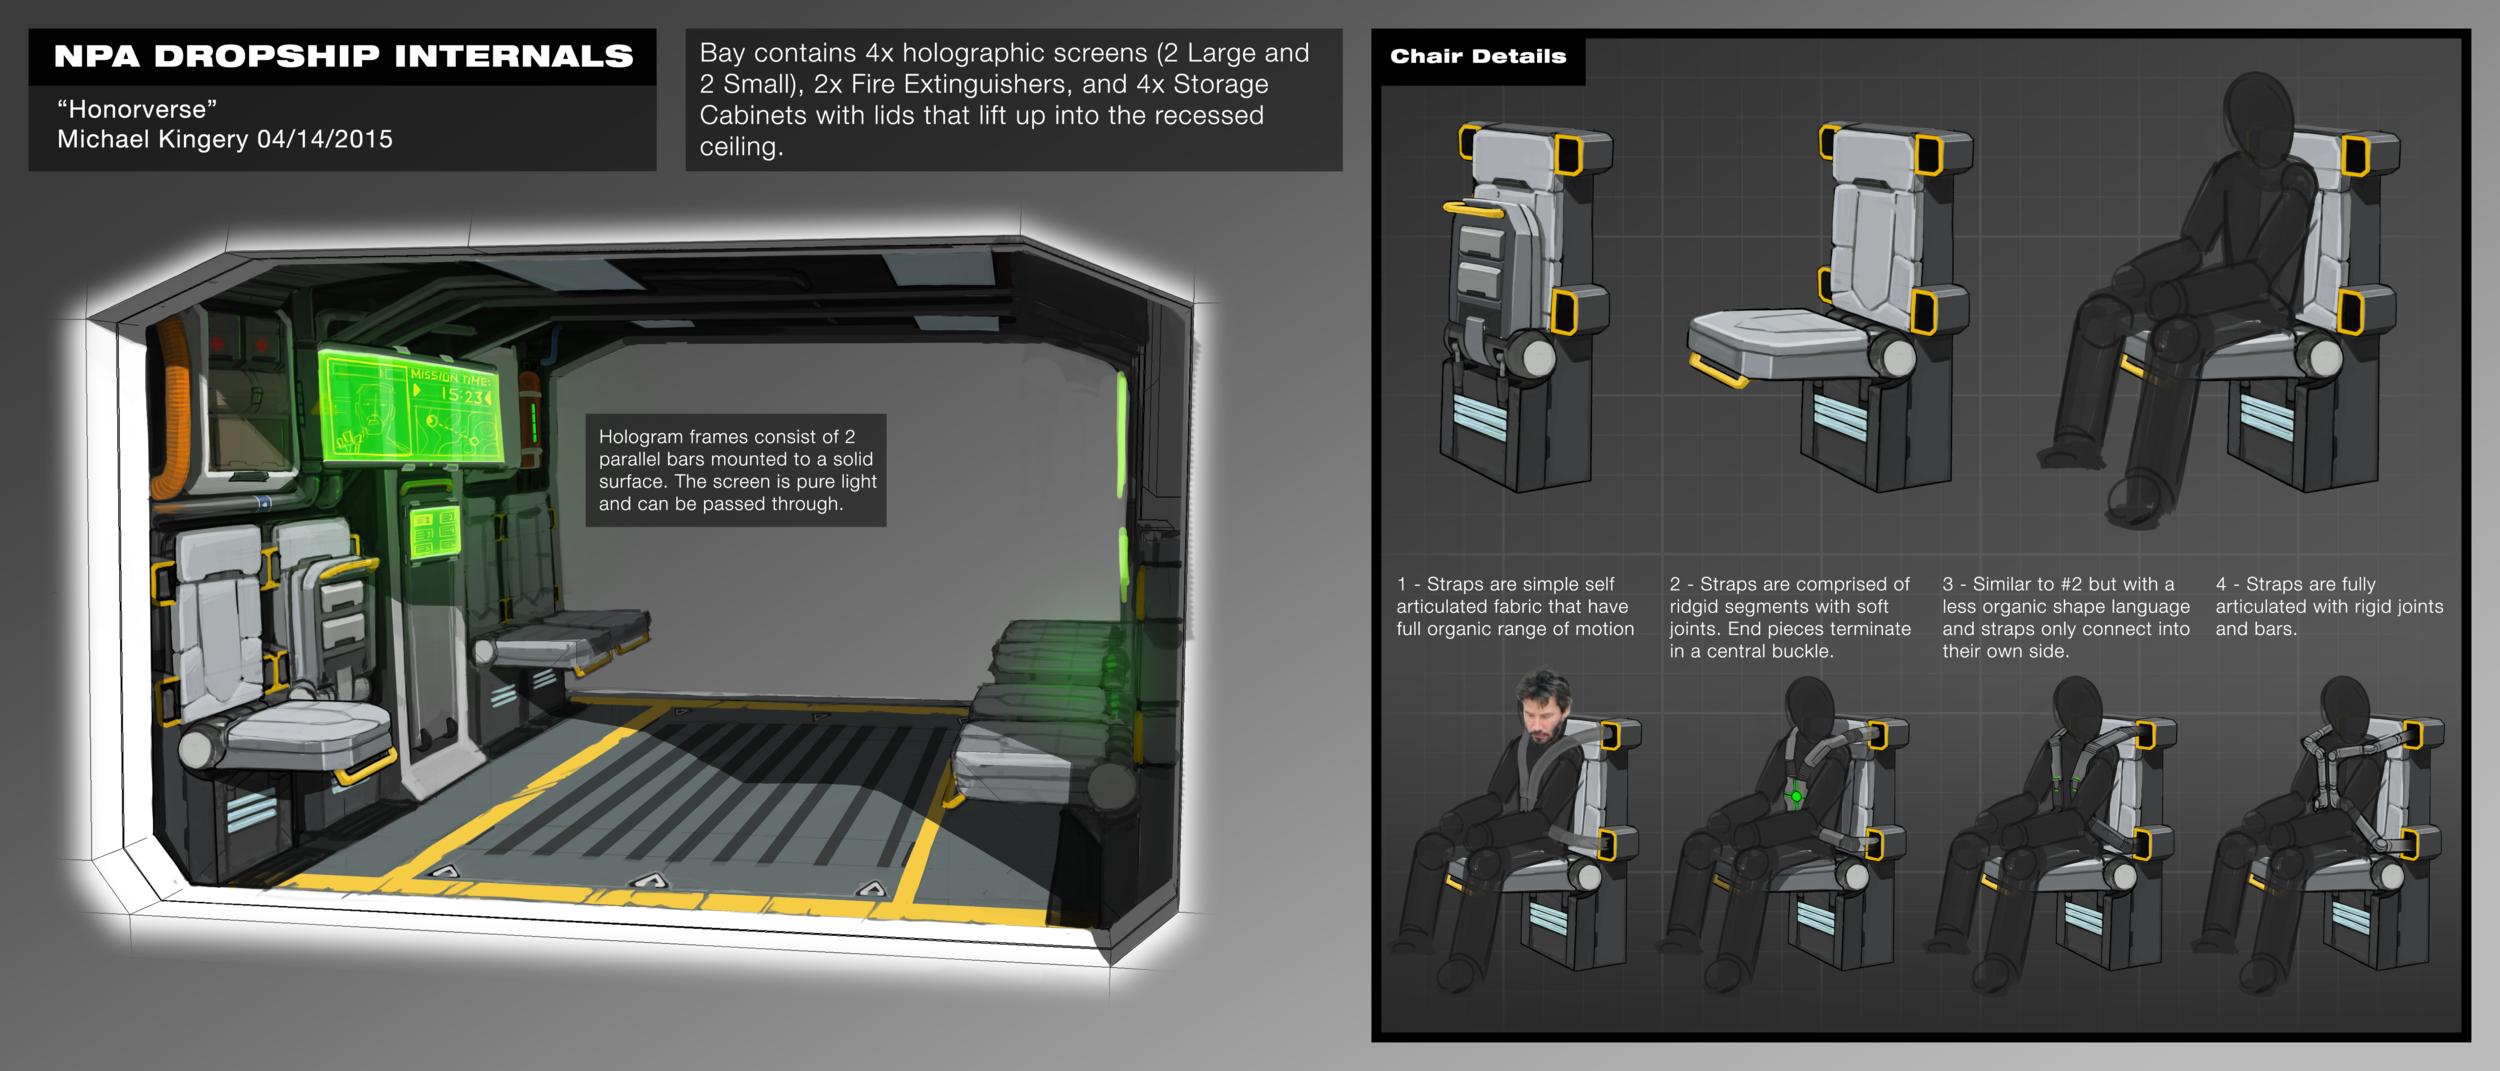 HV - Dropship Interior.png